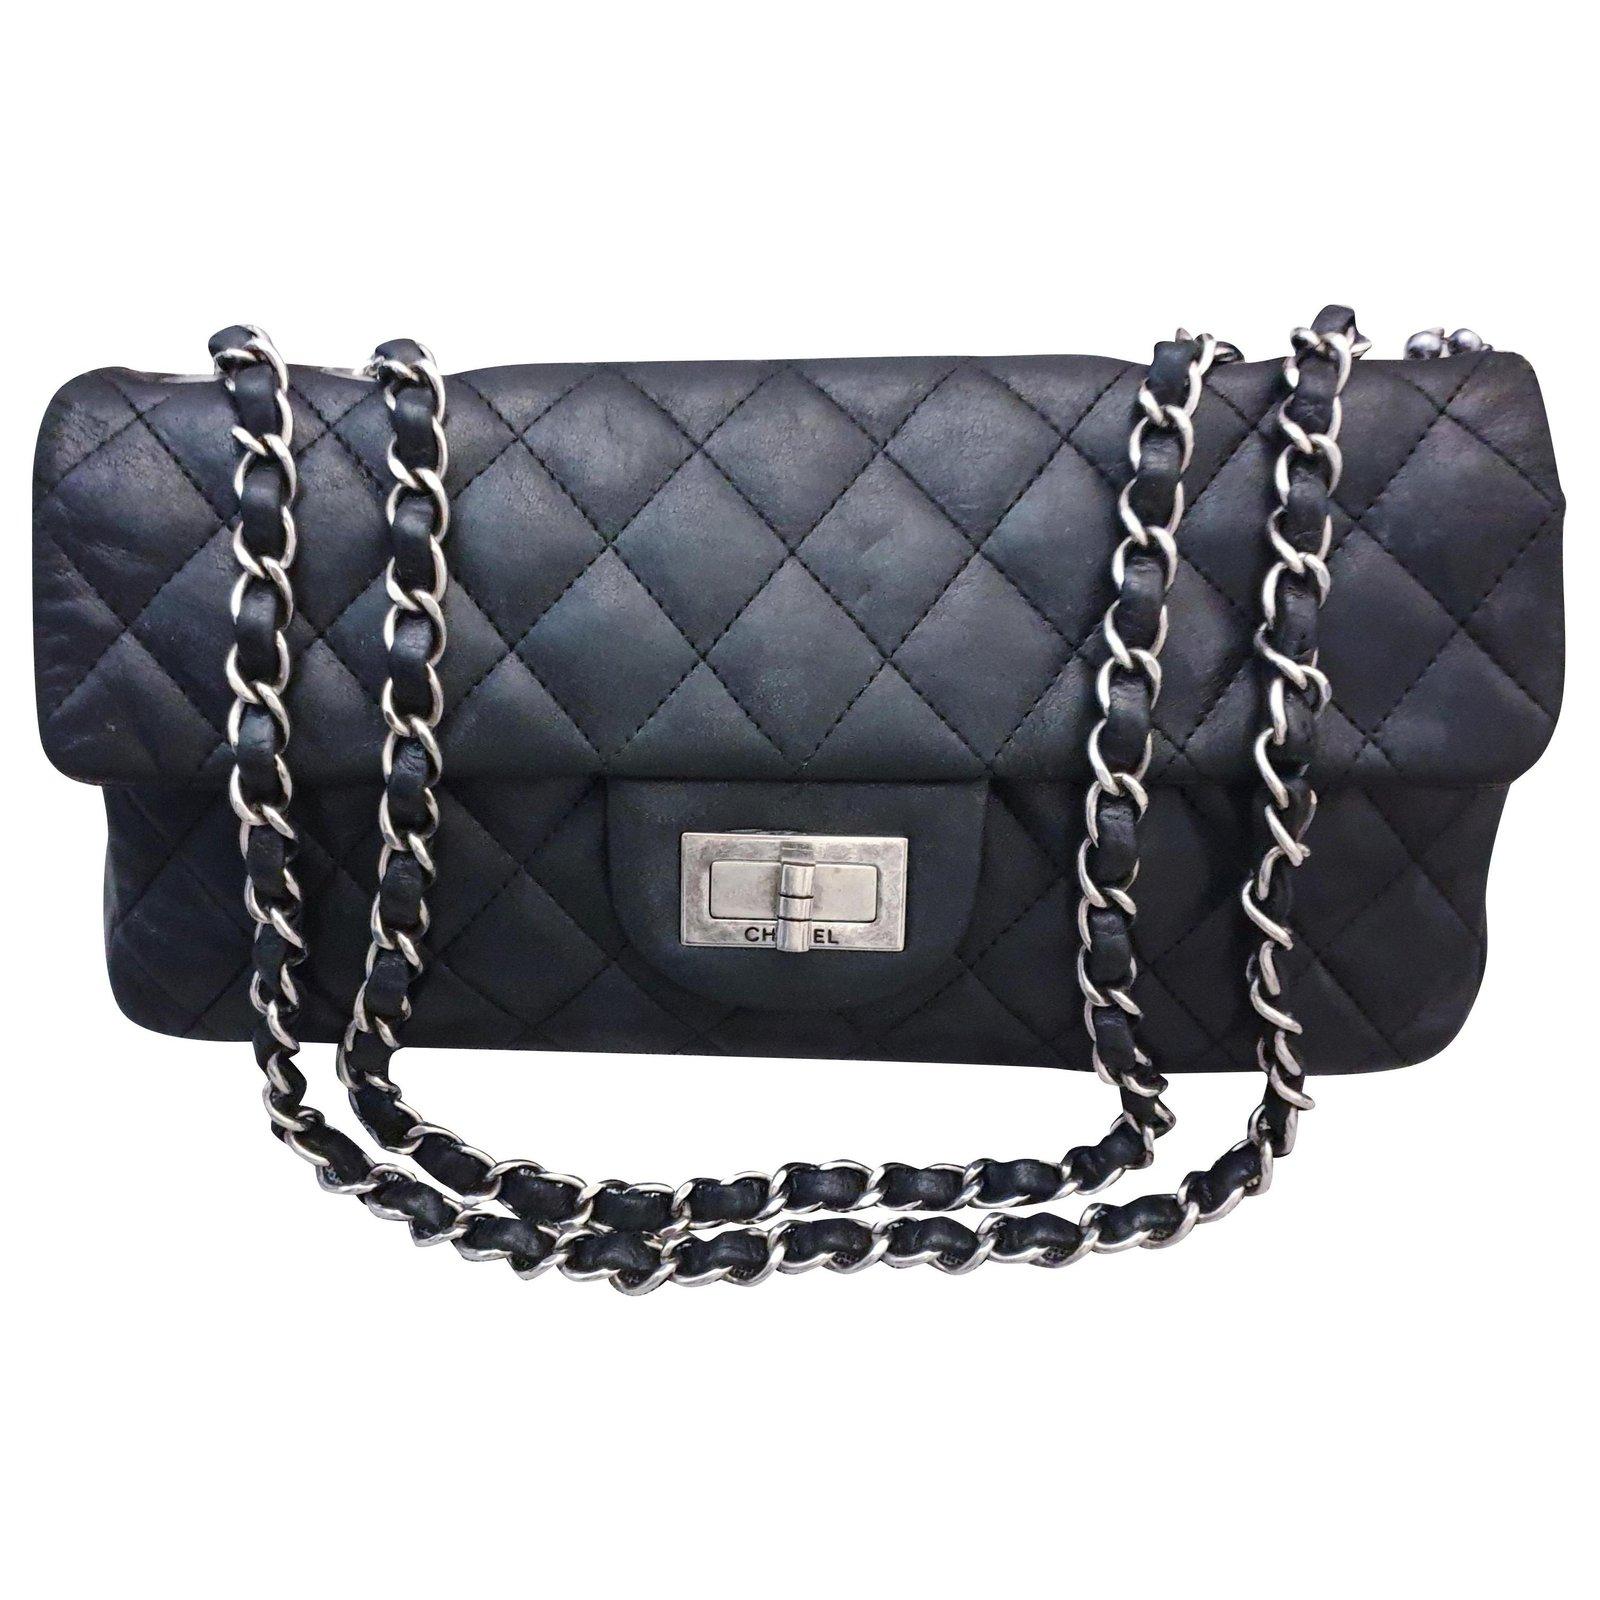 94fdbdf1cde357 Chanel Chanel Reissue chanel bag 2.55 Handbags Leather Black,Metallic  ref.111971